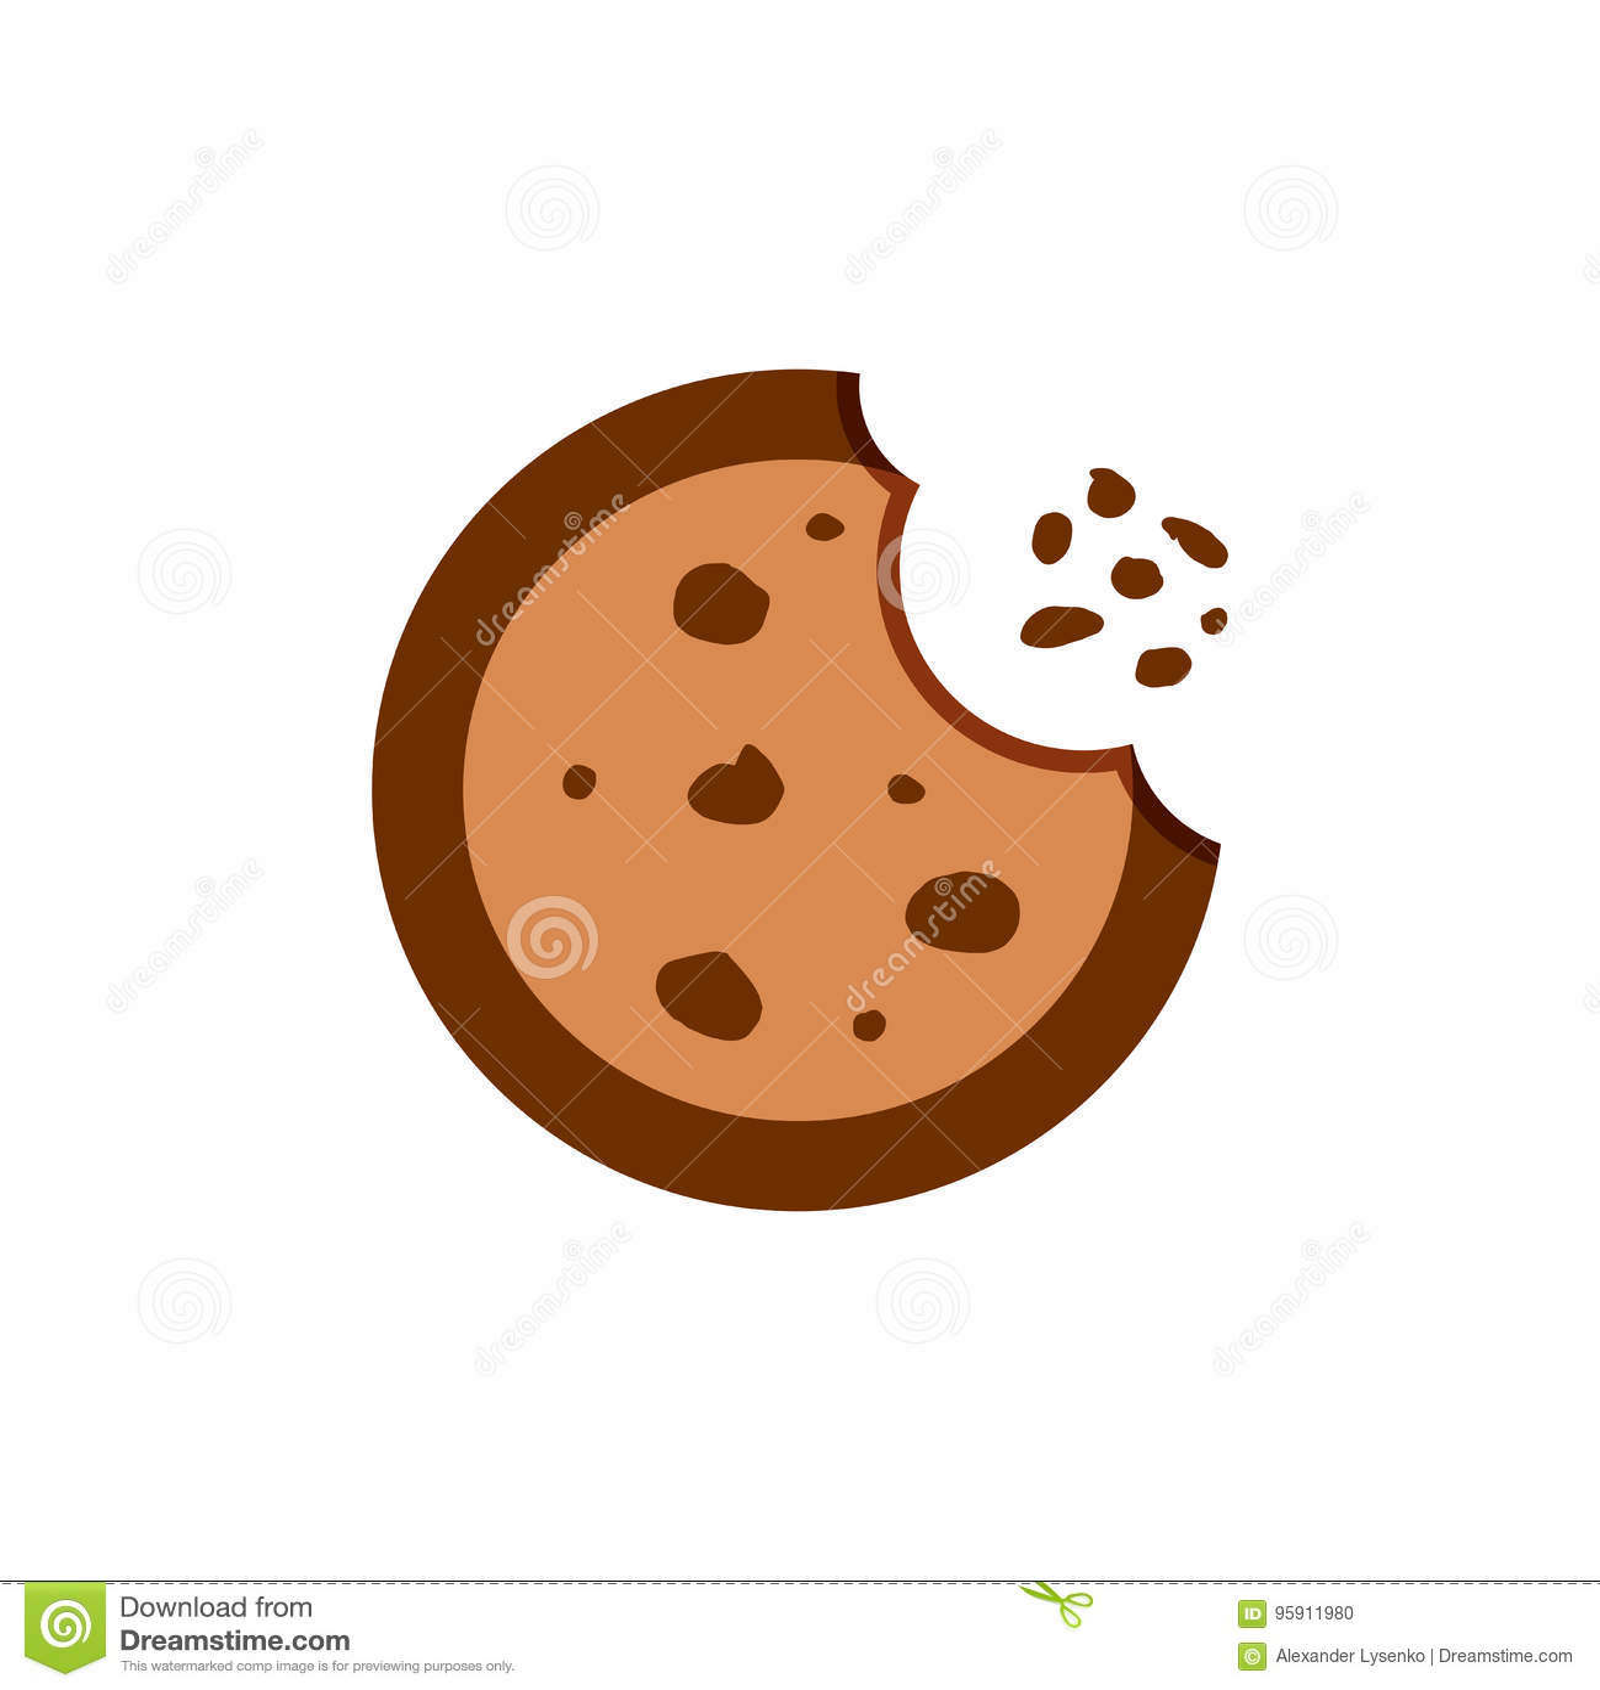 Cookie flat vector icon. Chip biscuit illustration. Dessert food